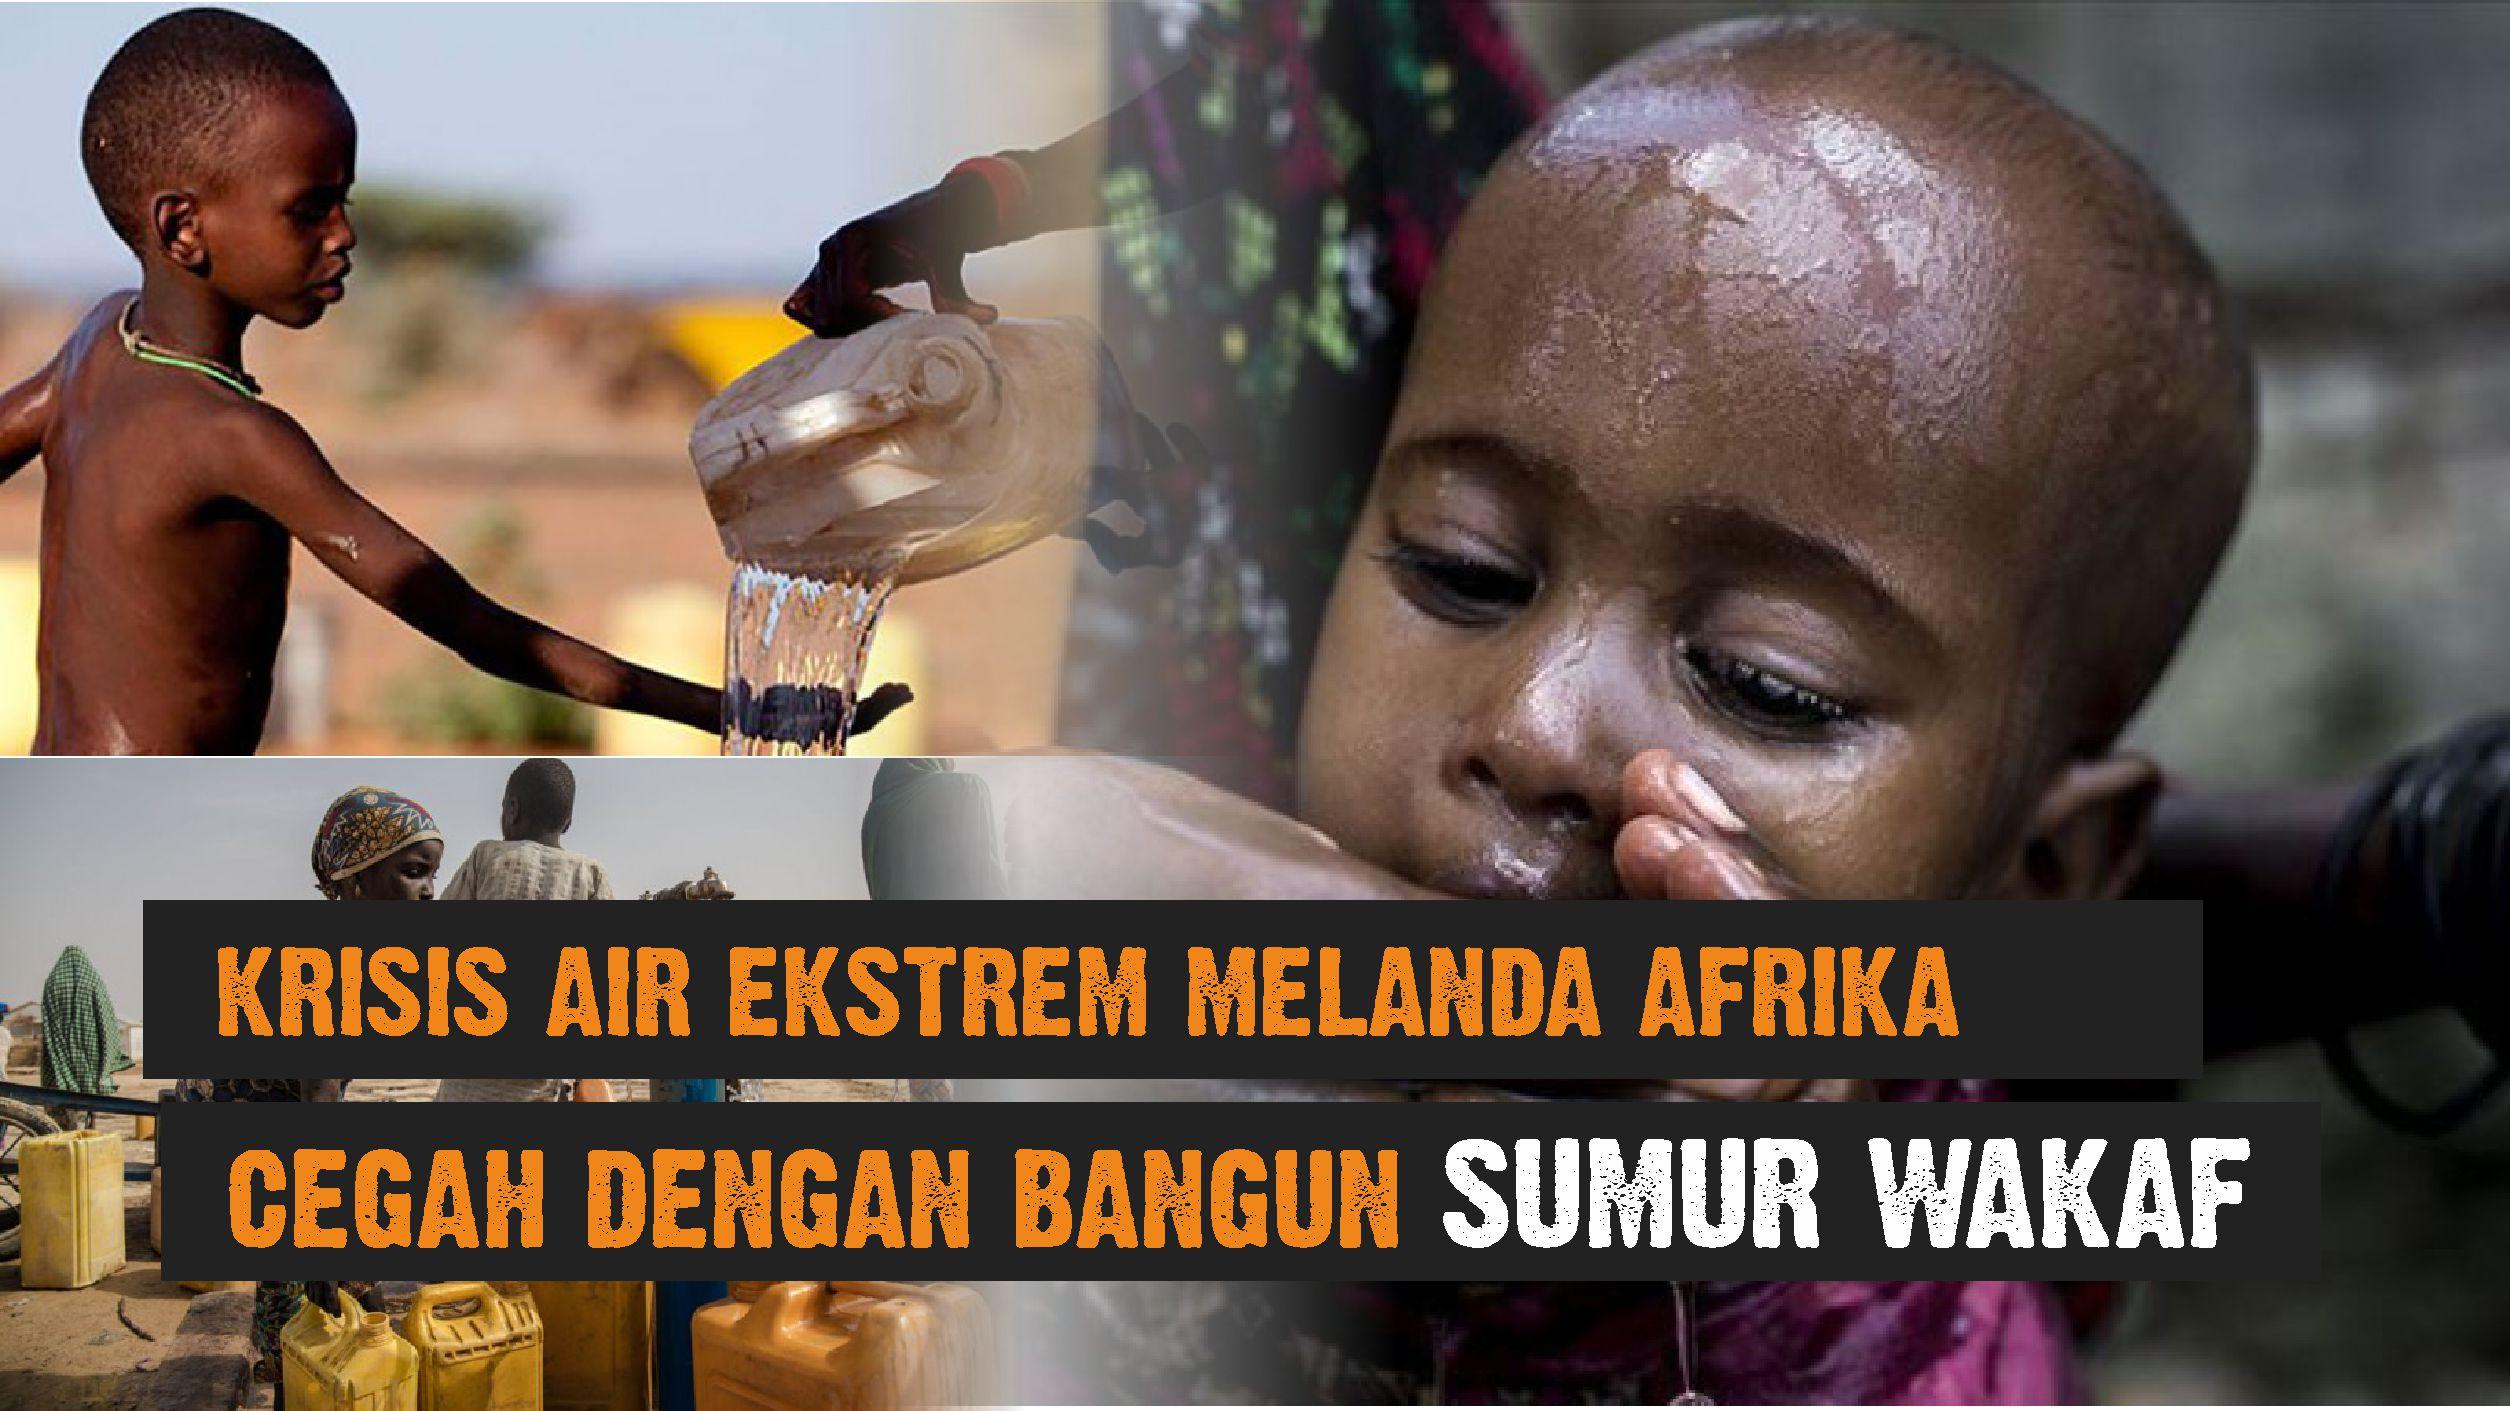 Cegah Krisis Air Ekstrem, Bangun Sumur Wakaf Afrika